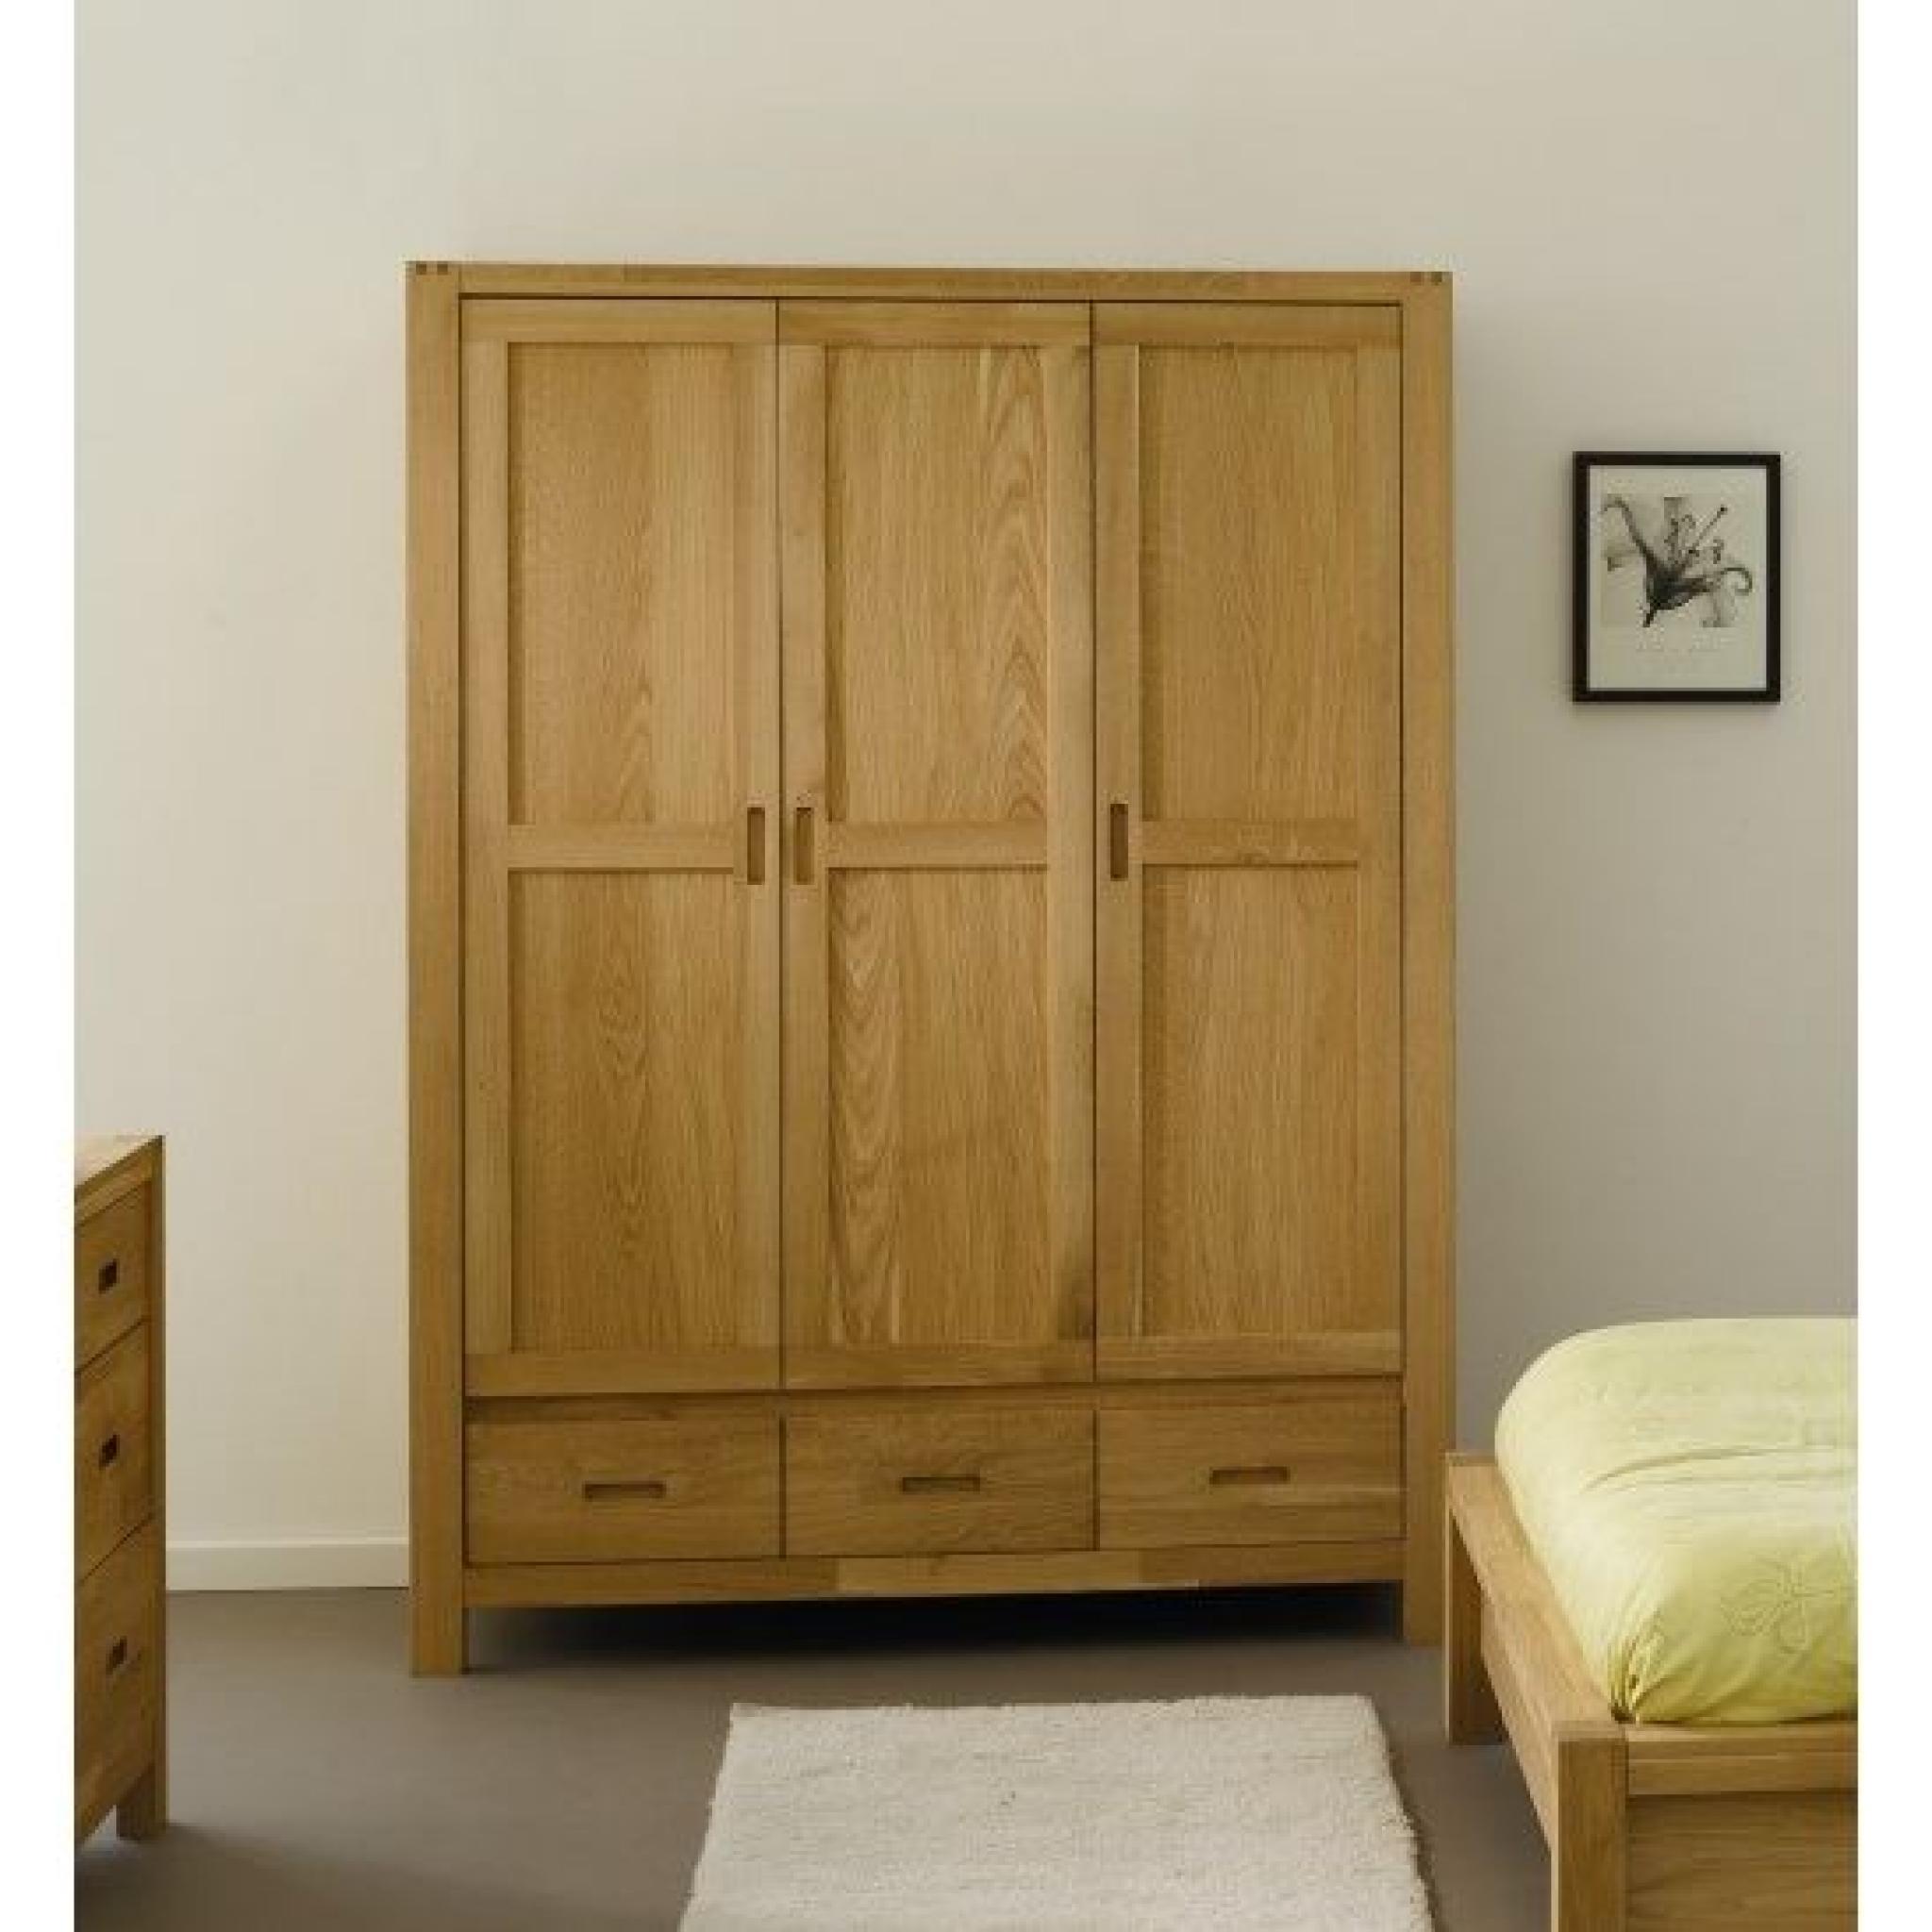 nathan armoire 3 portes en ch ne massif achat vente. Black Bedroom Furniture Sets. Home Design Ideas